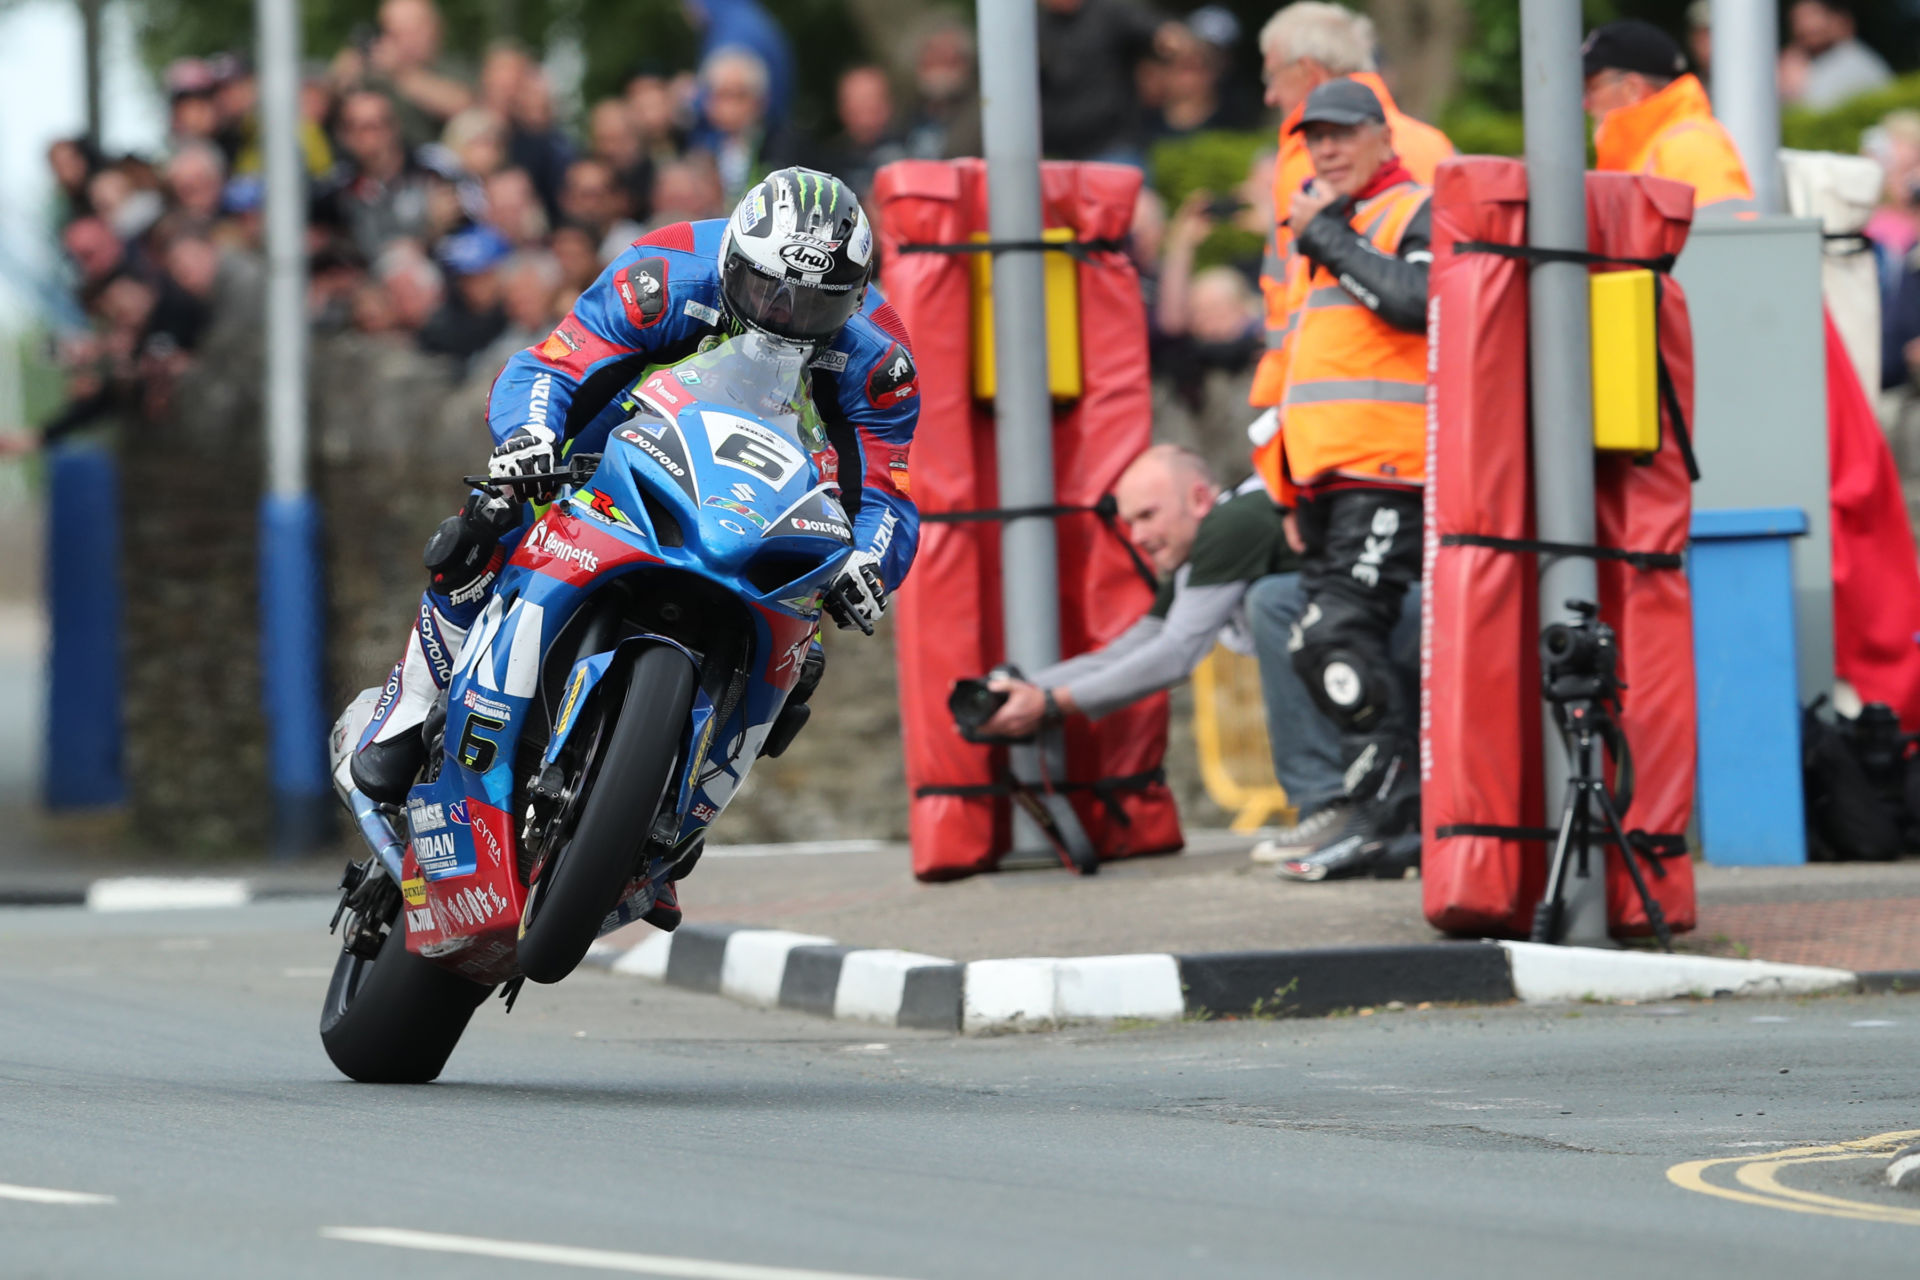 Michael Dunlop (6) during the Senior TT at the 2017 Isle of Man TT. Photo courtesy Isle of Man TT Press Office.